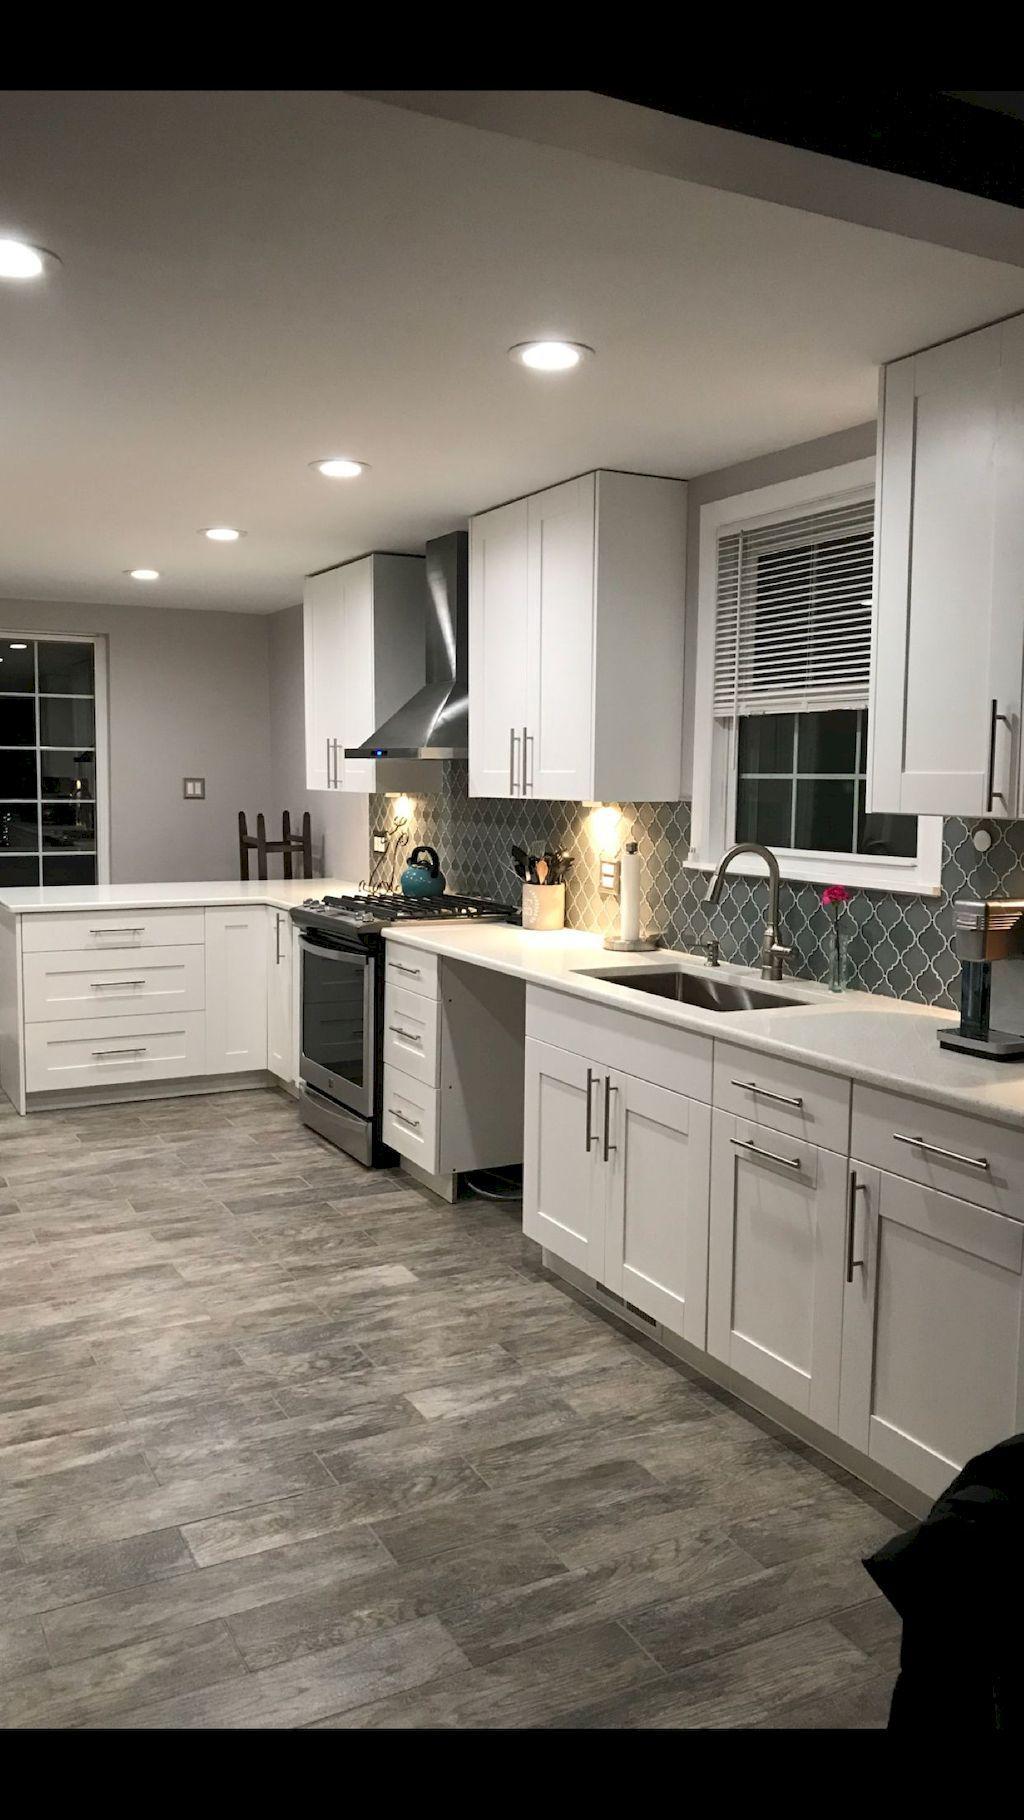 65 Farmhouse Kitchen Backsplash Design Ideas images